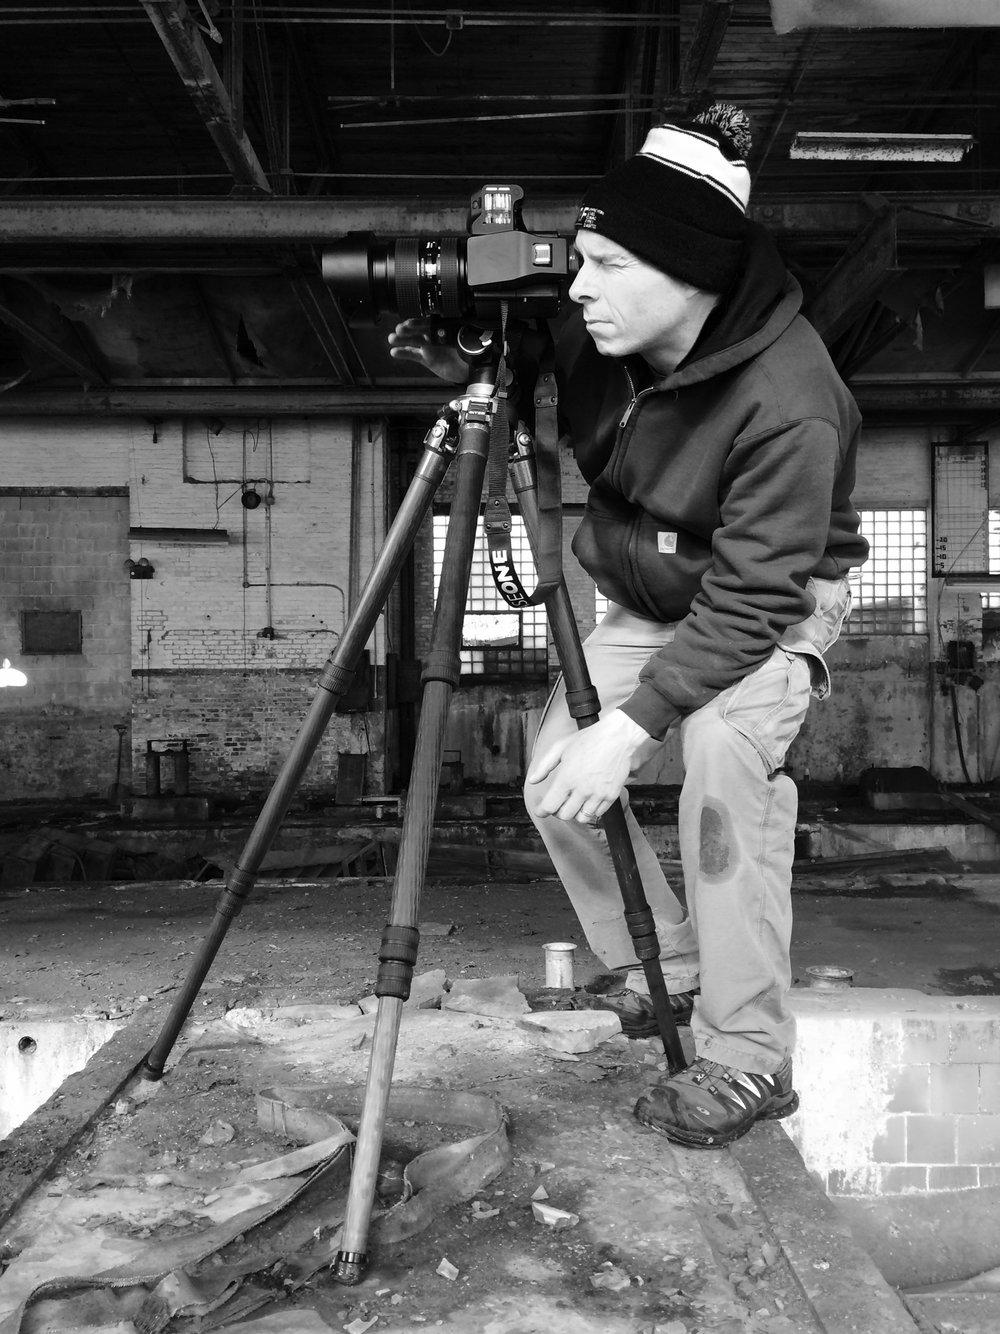 Photographer Joe Wallace